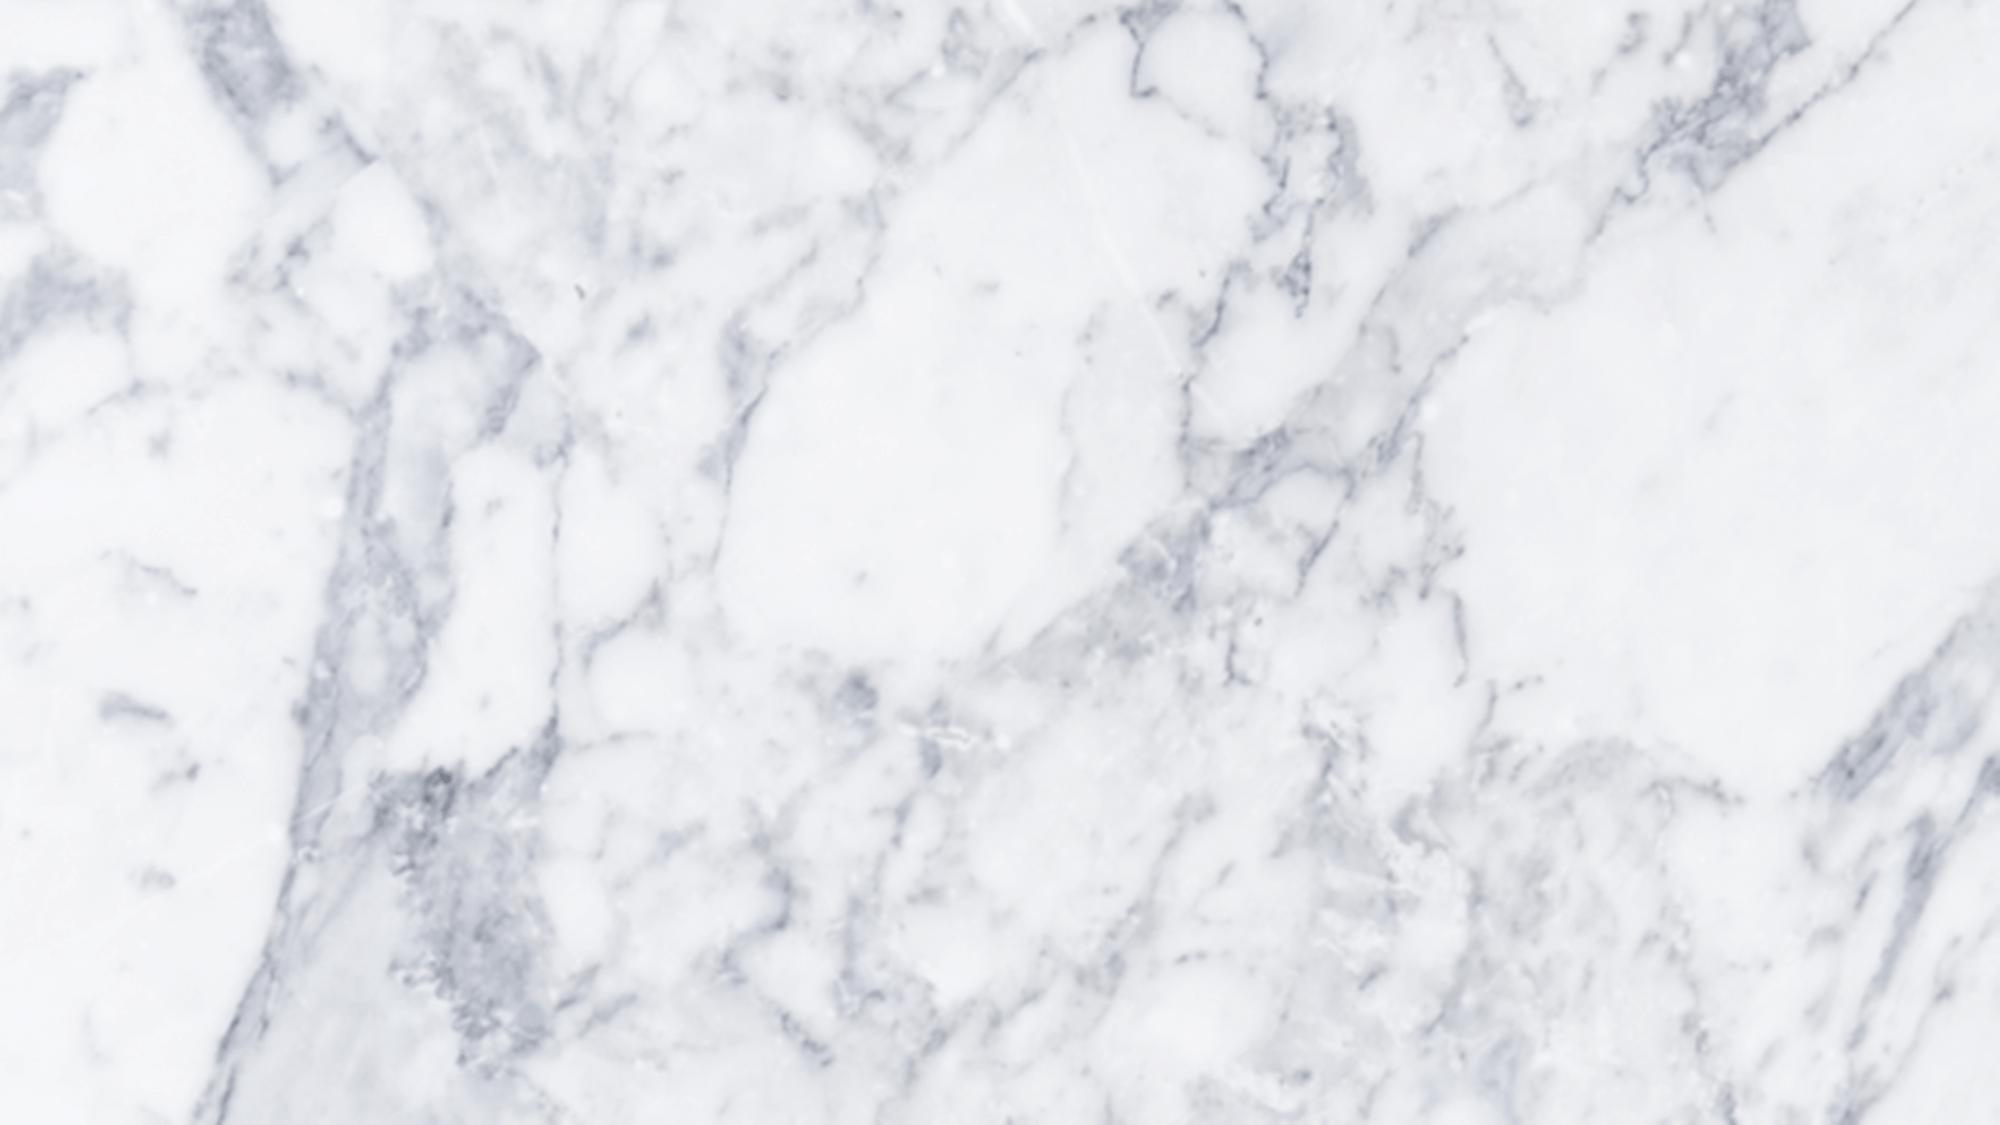 Tumblr Marble Desktop Wallpapers Top Free Tumblr Marble Desktop Backgrounds Wallpaperaccess